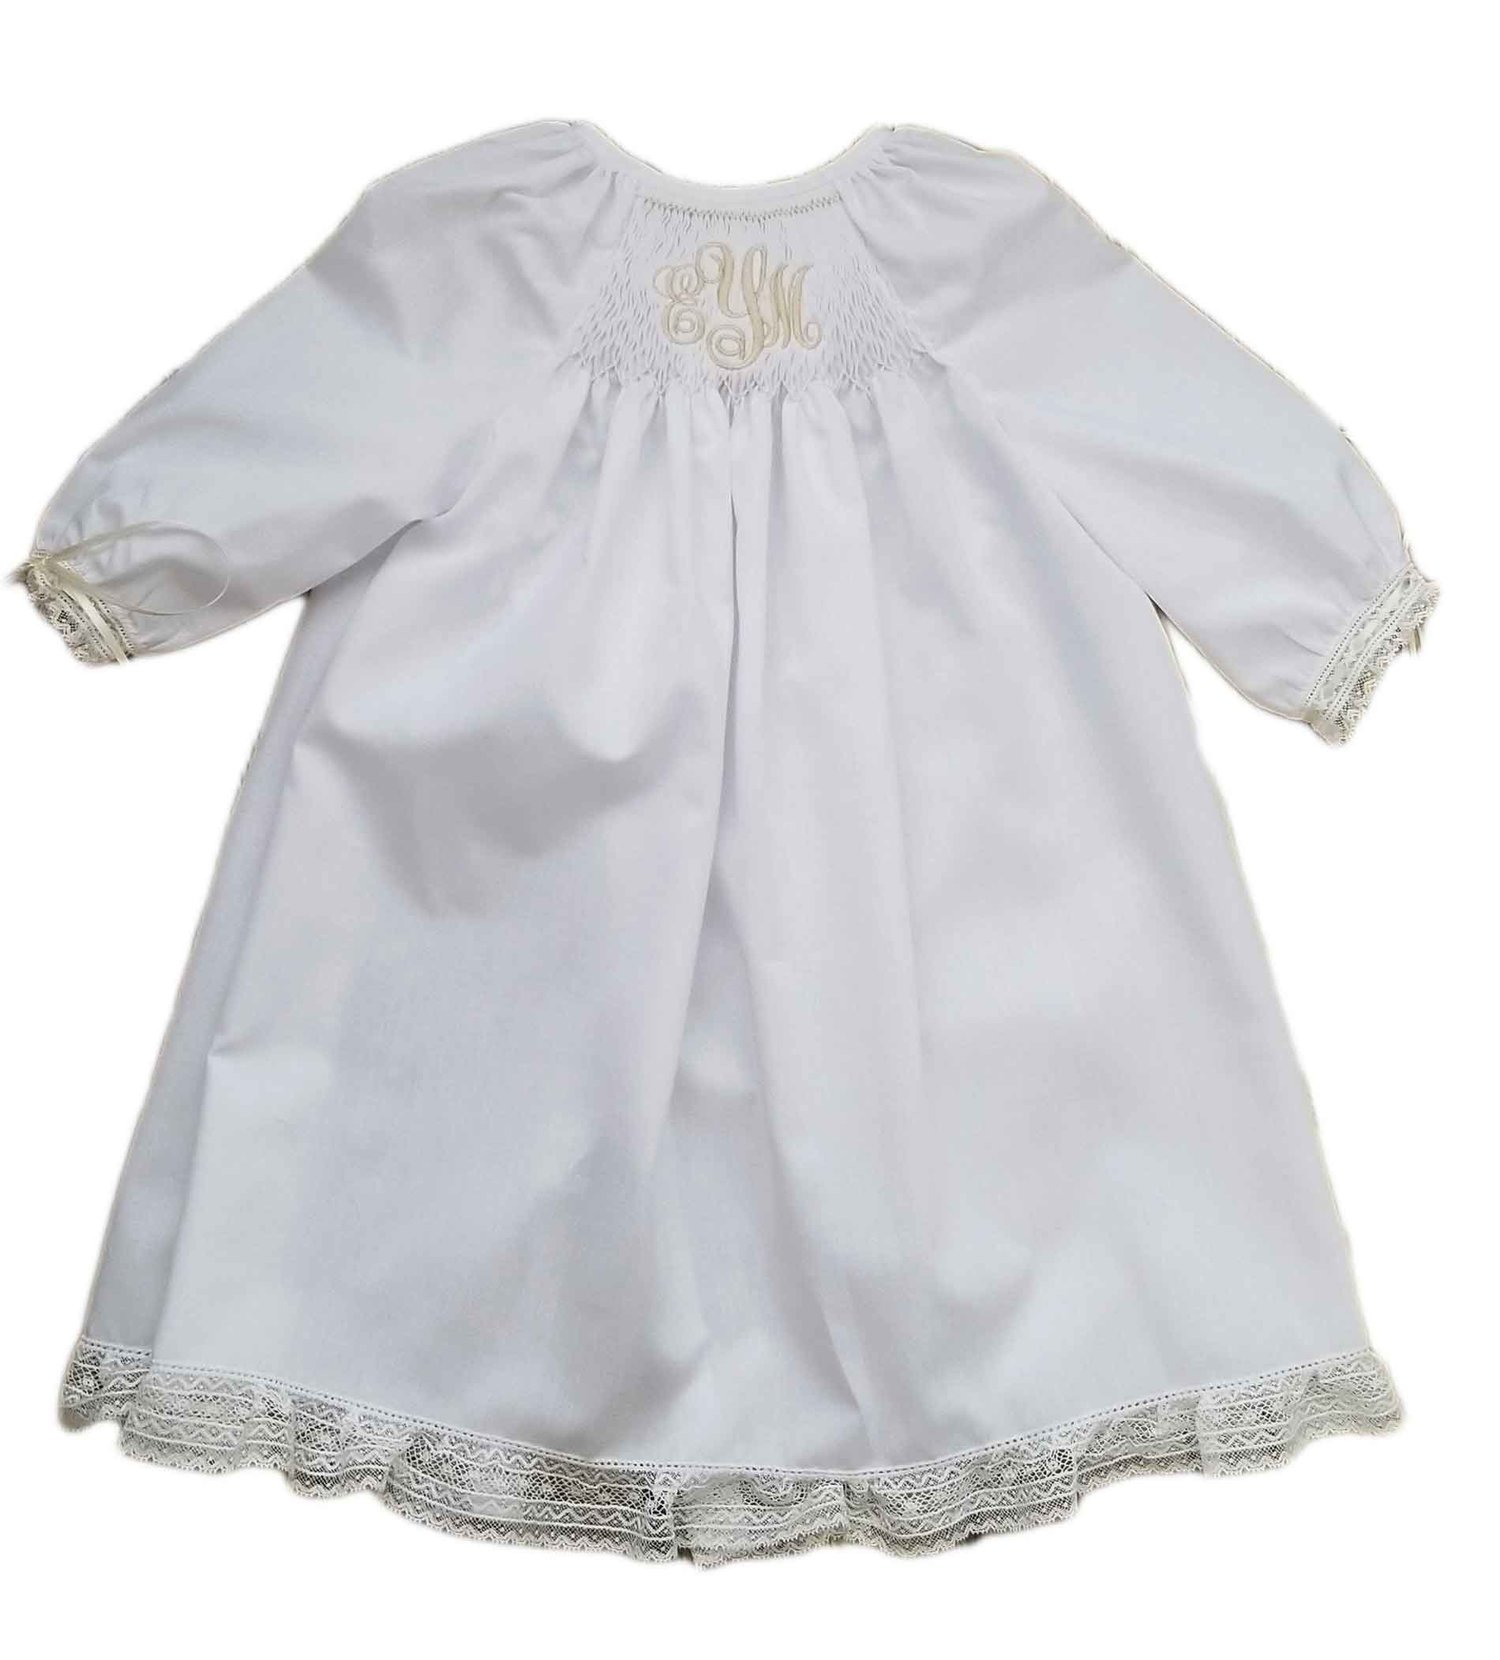 White & Ecru Smocked Monogrammed Baby Gown — White & Ecru Smocked ...